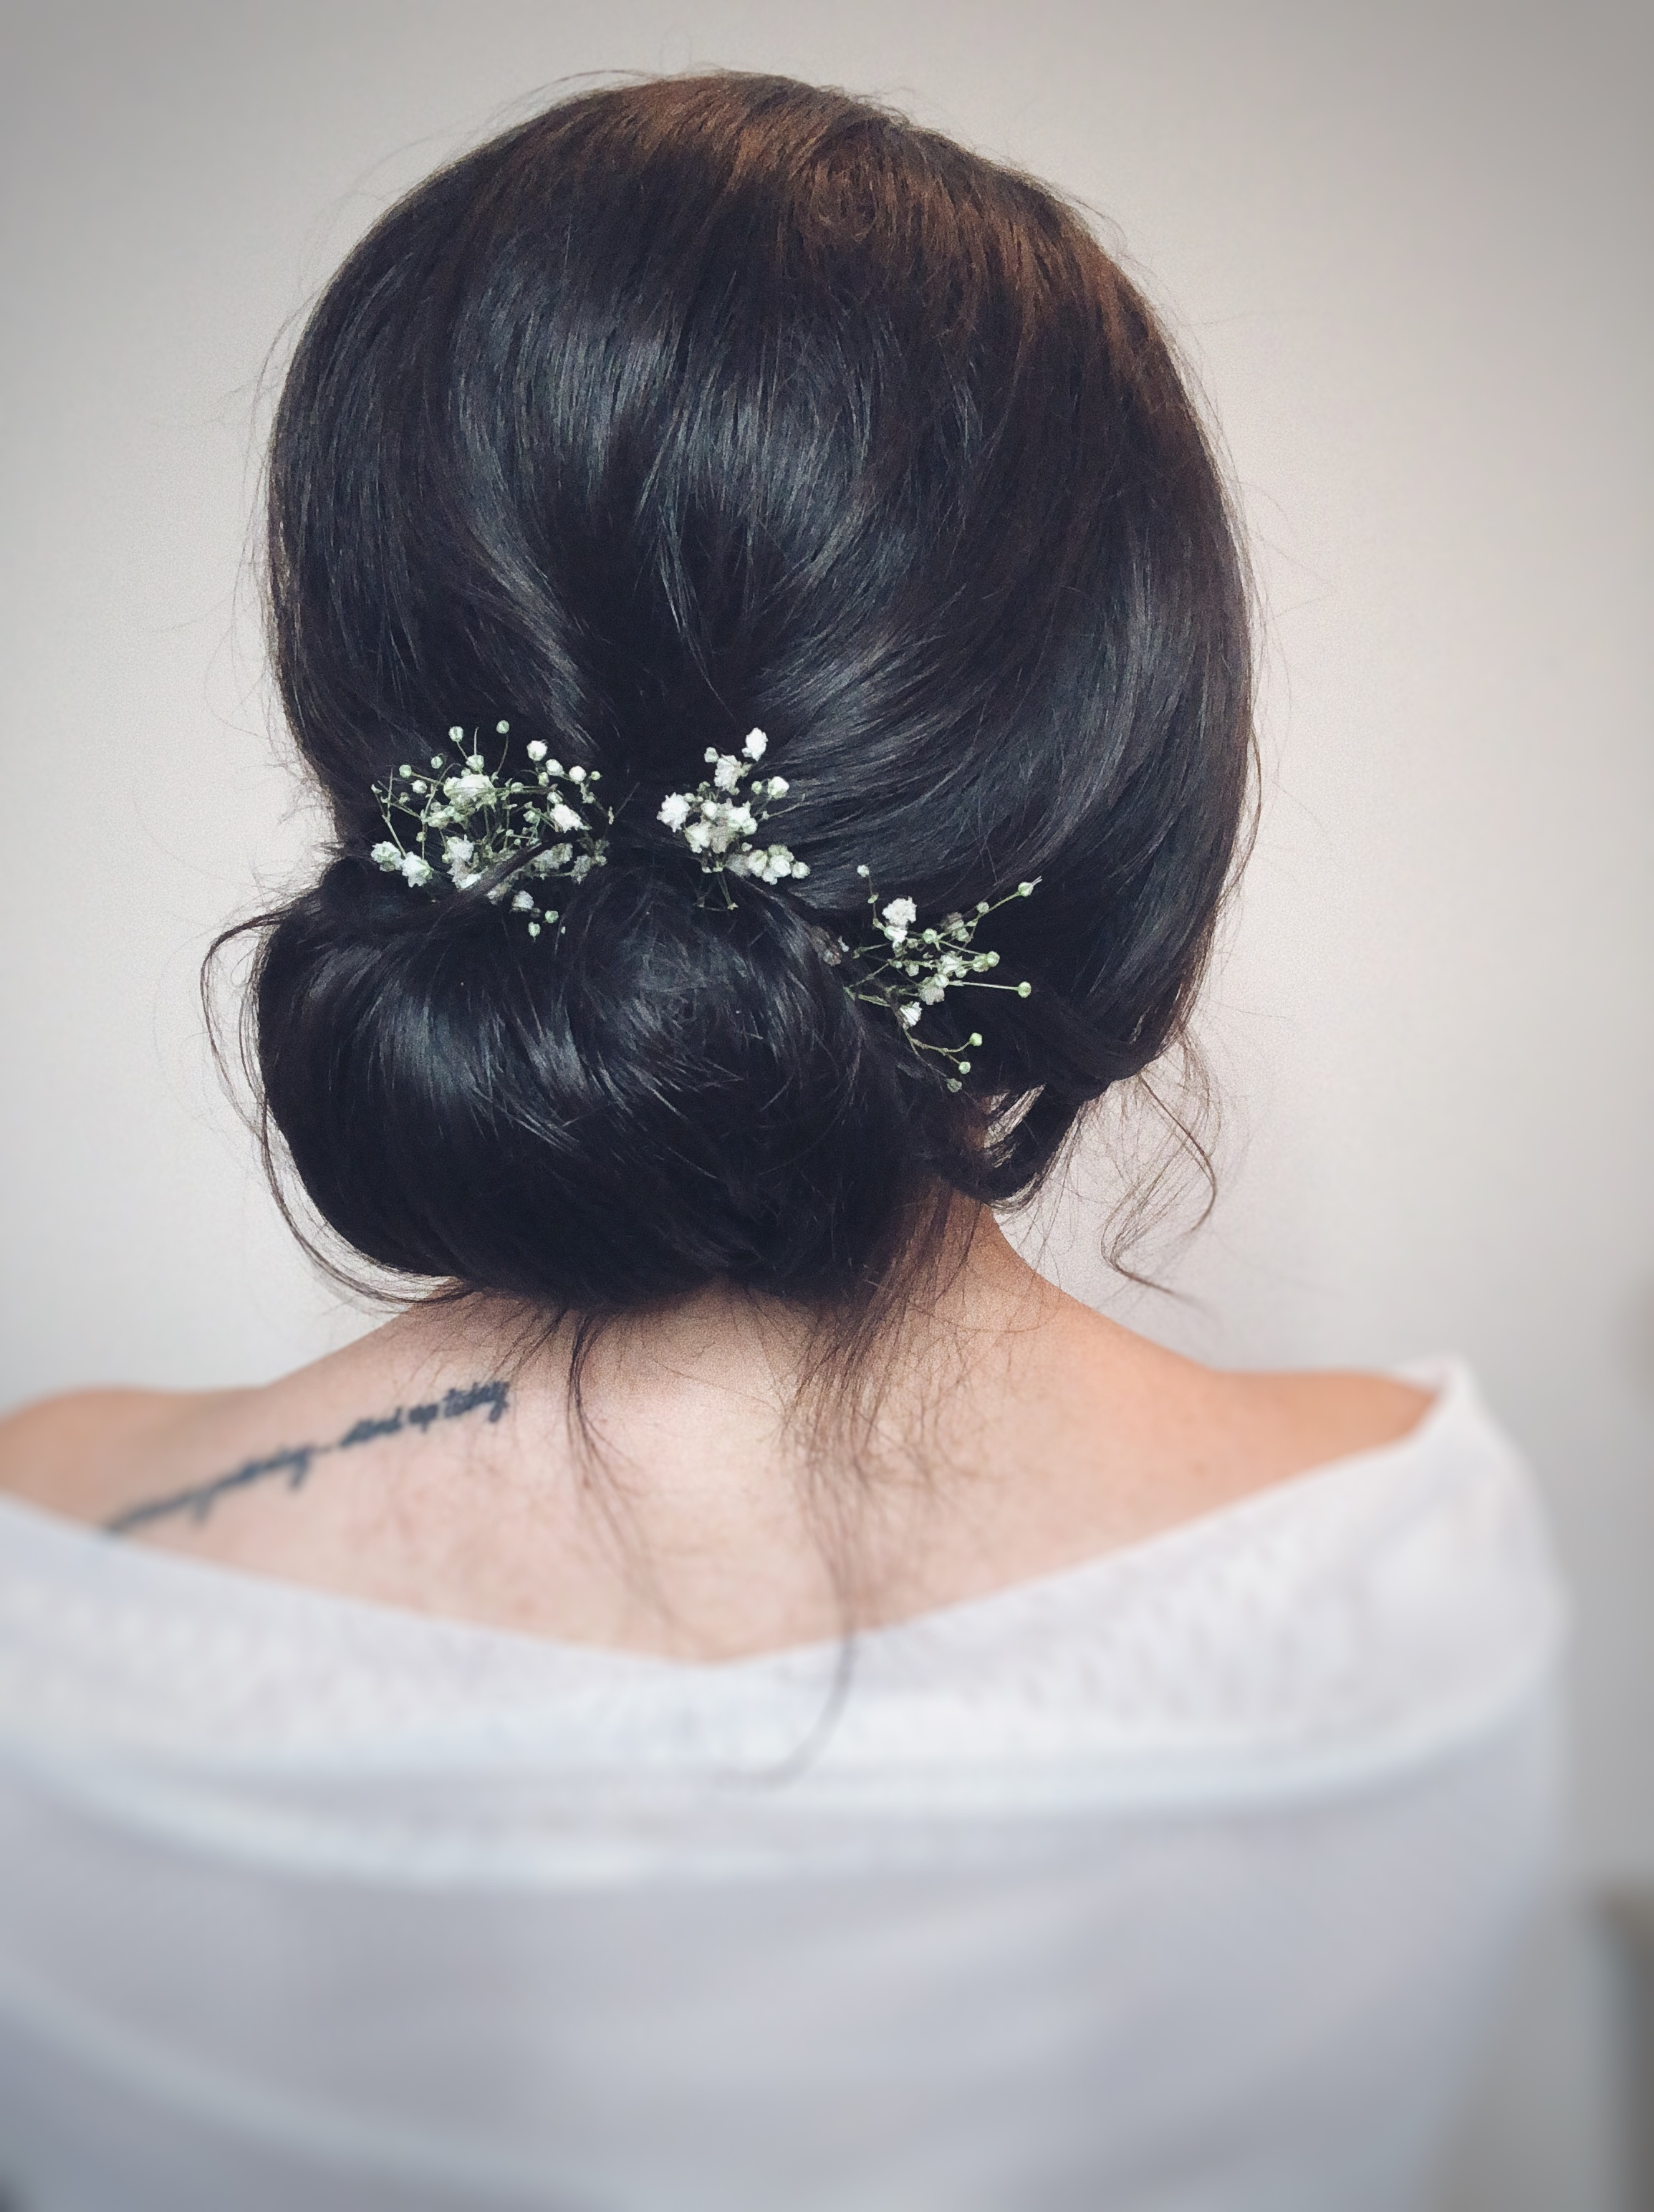 low bun wedding hairstyle updo idea with babysbreath